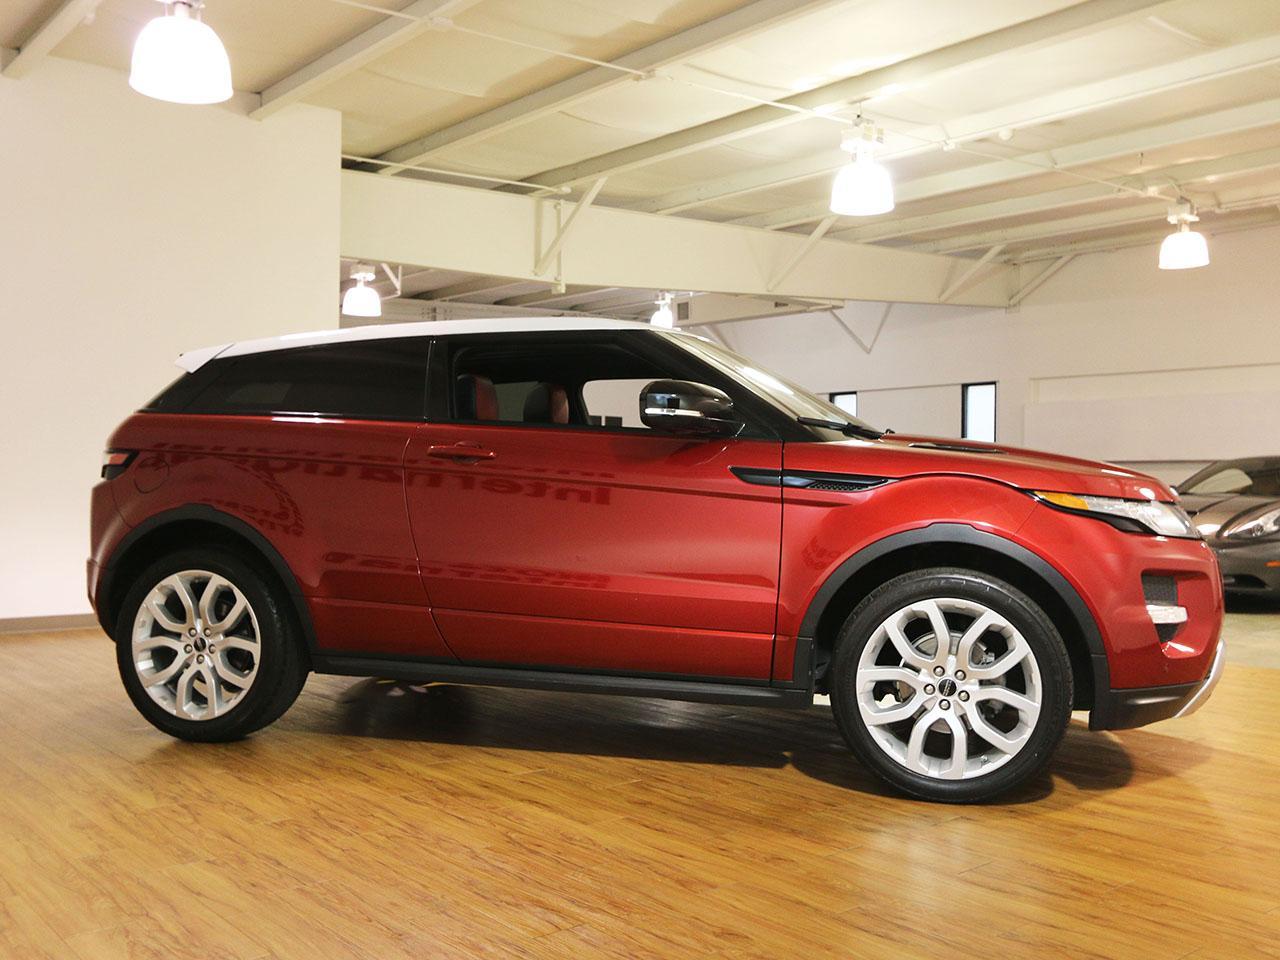 2012 land rover evoque coupe. Black Bedroom Furniture Sets. Home Design Ideas